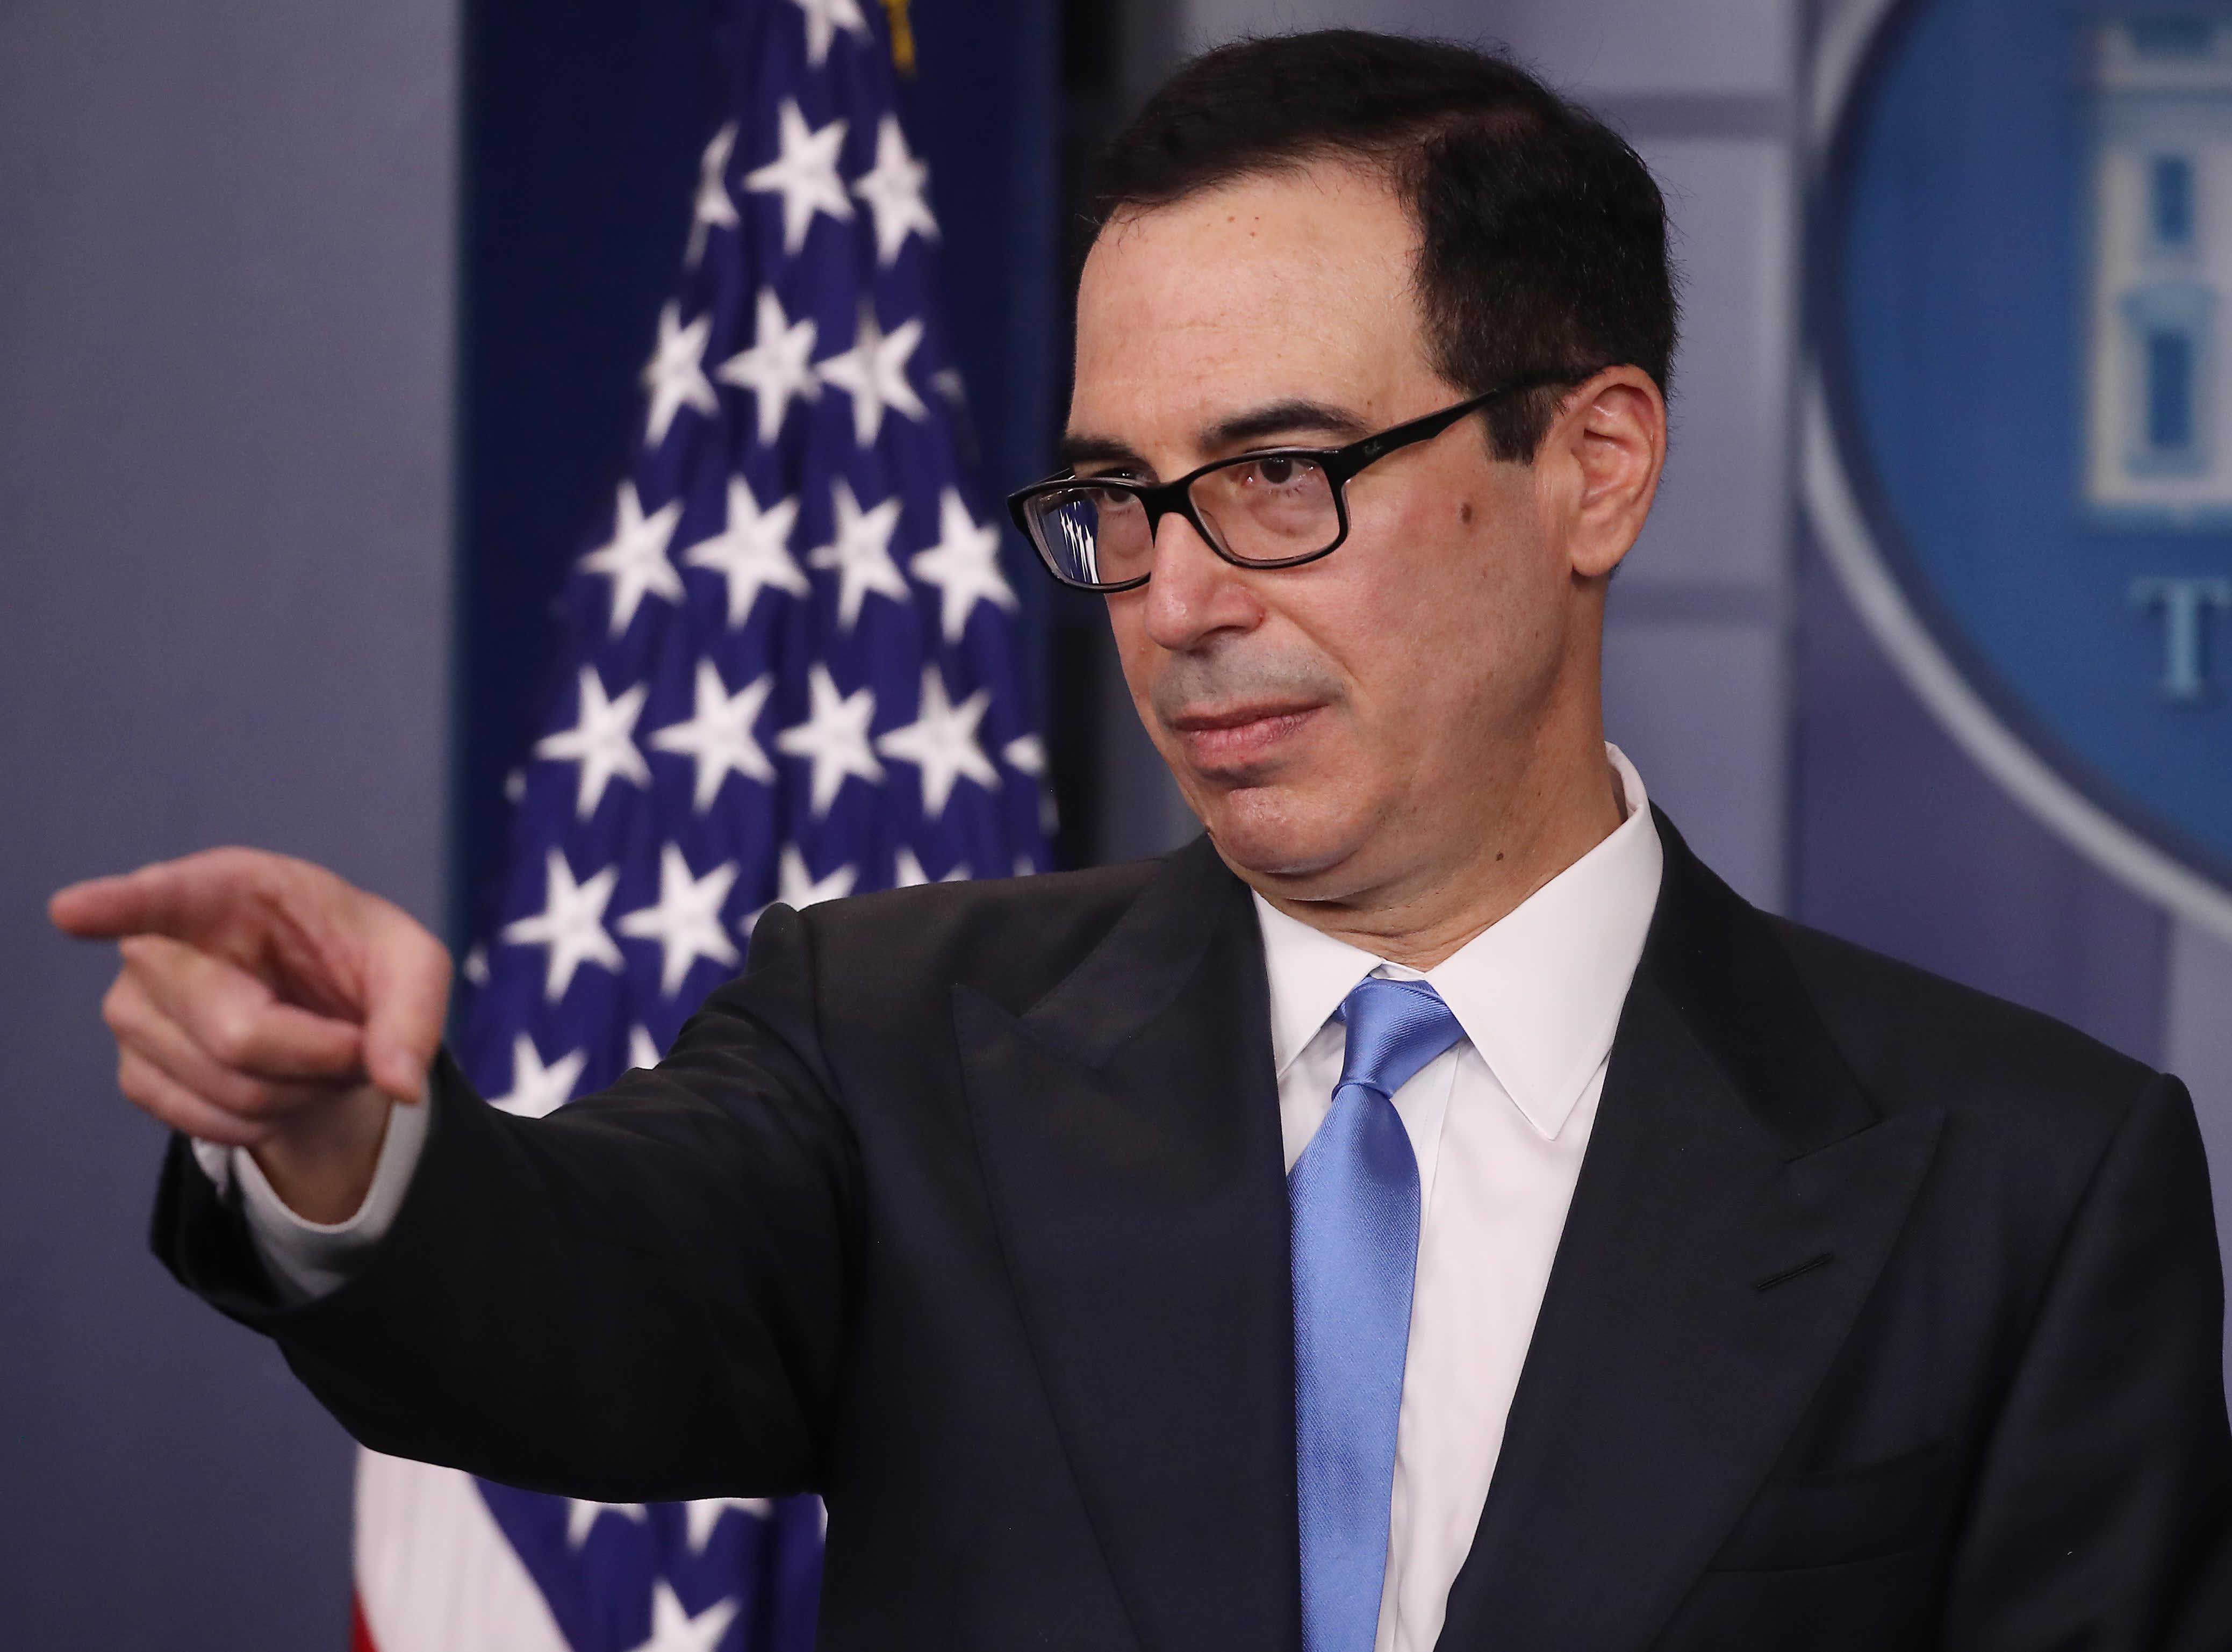 Treasury Secretary Mnuchin says sanctions must be working for Iran leadership to be so upset